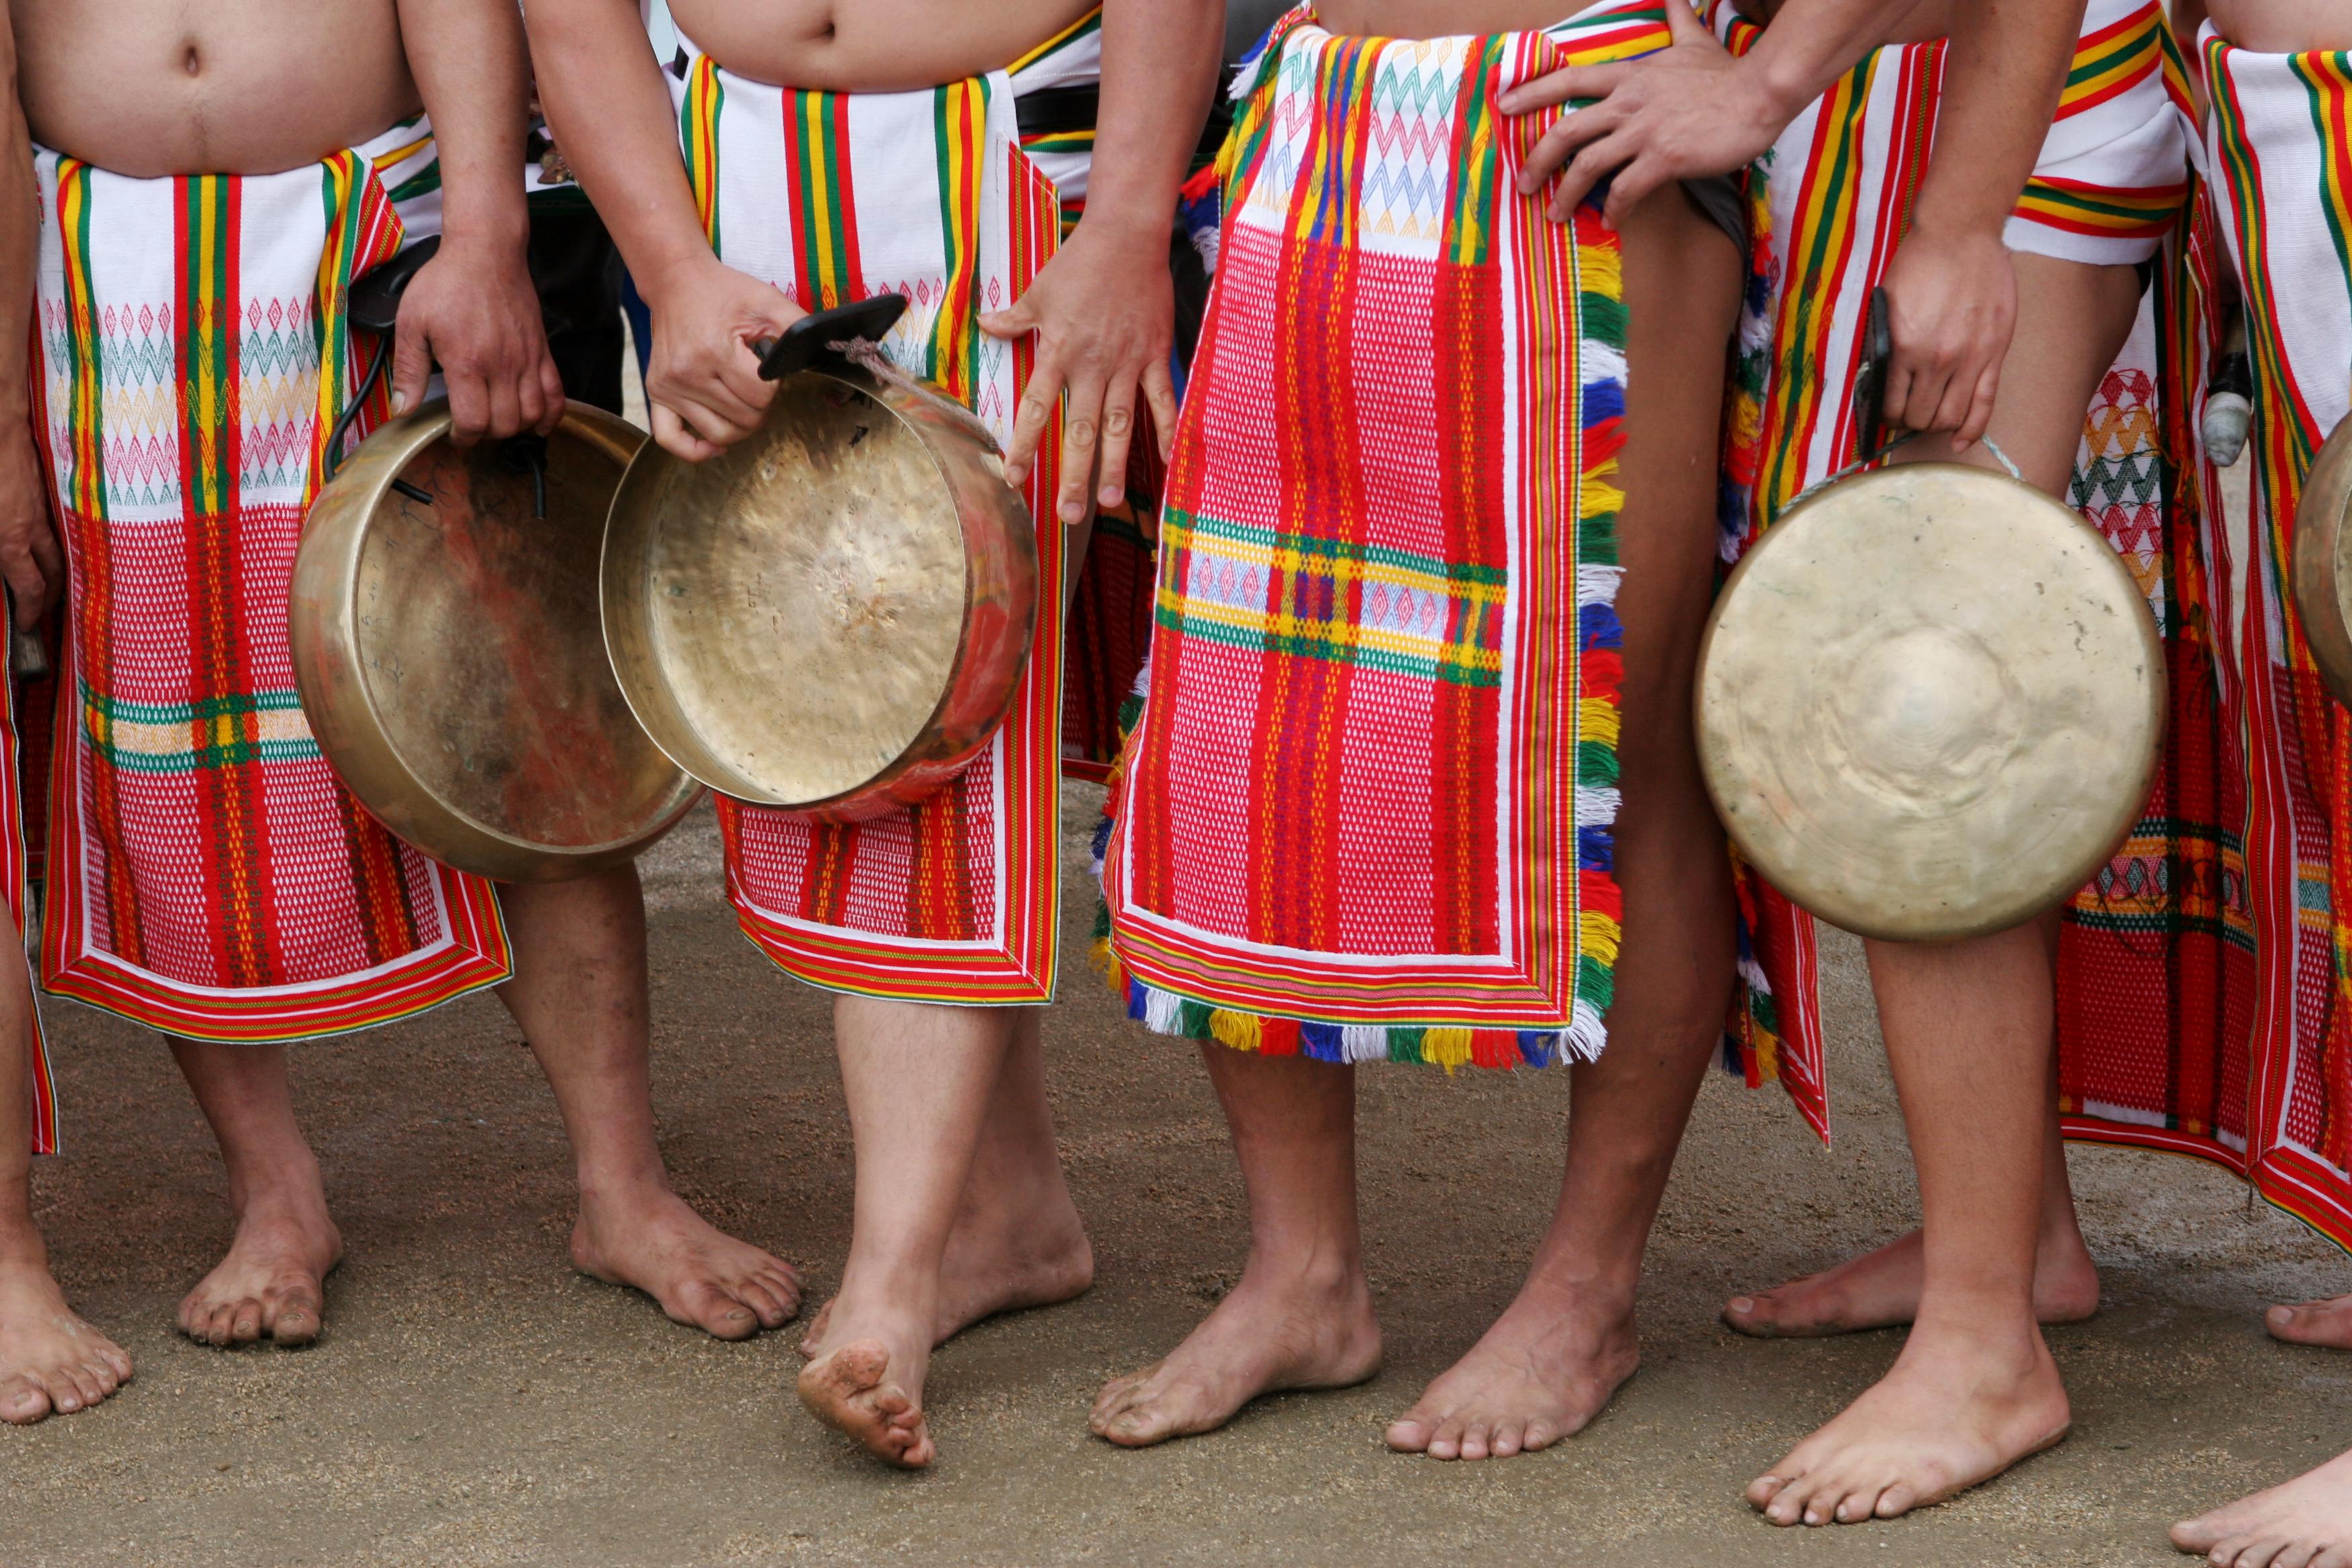 Parangal dance company philippine folk dance - Parangal Dance Company Philippine Folk Dance 58